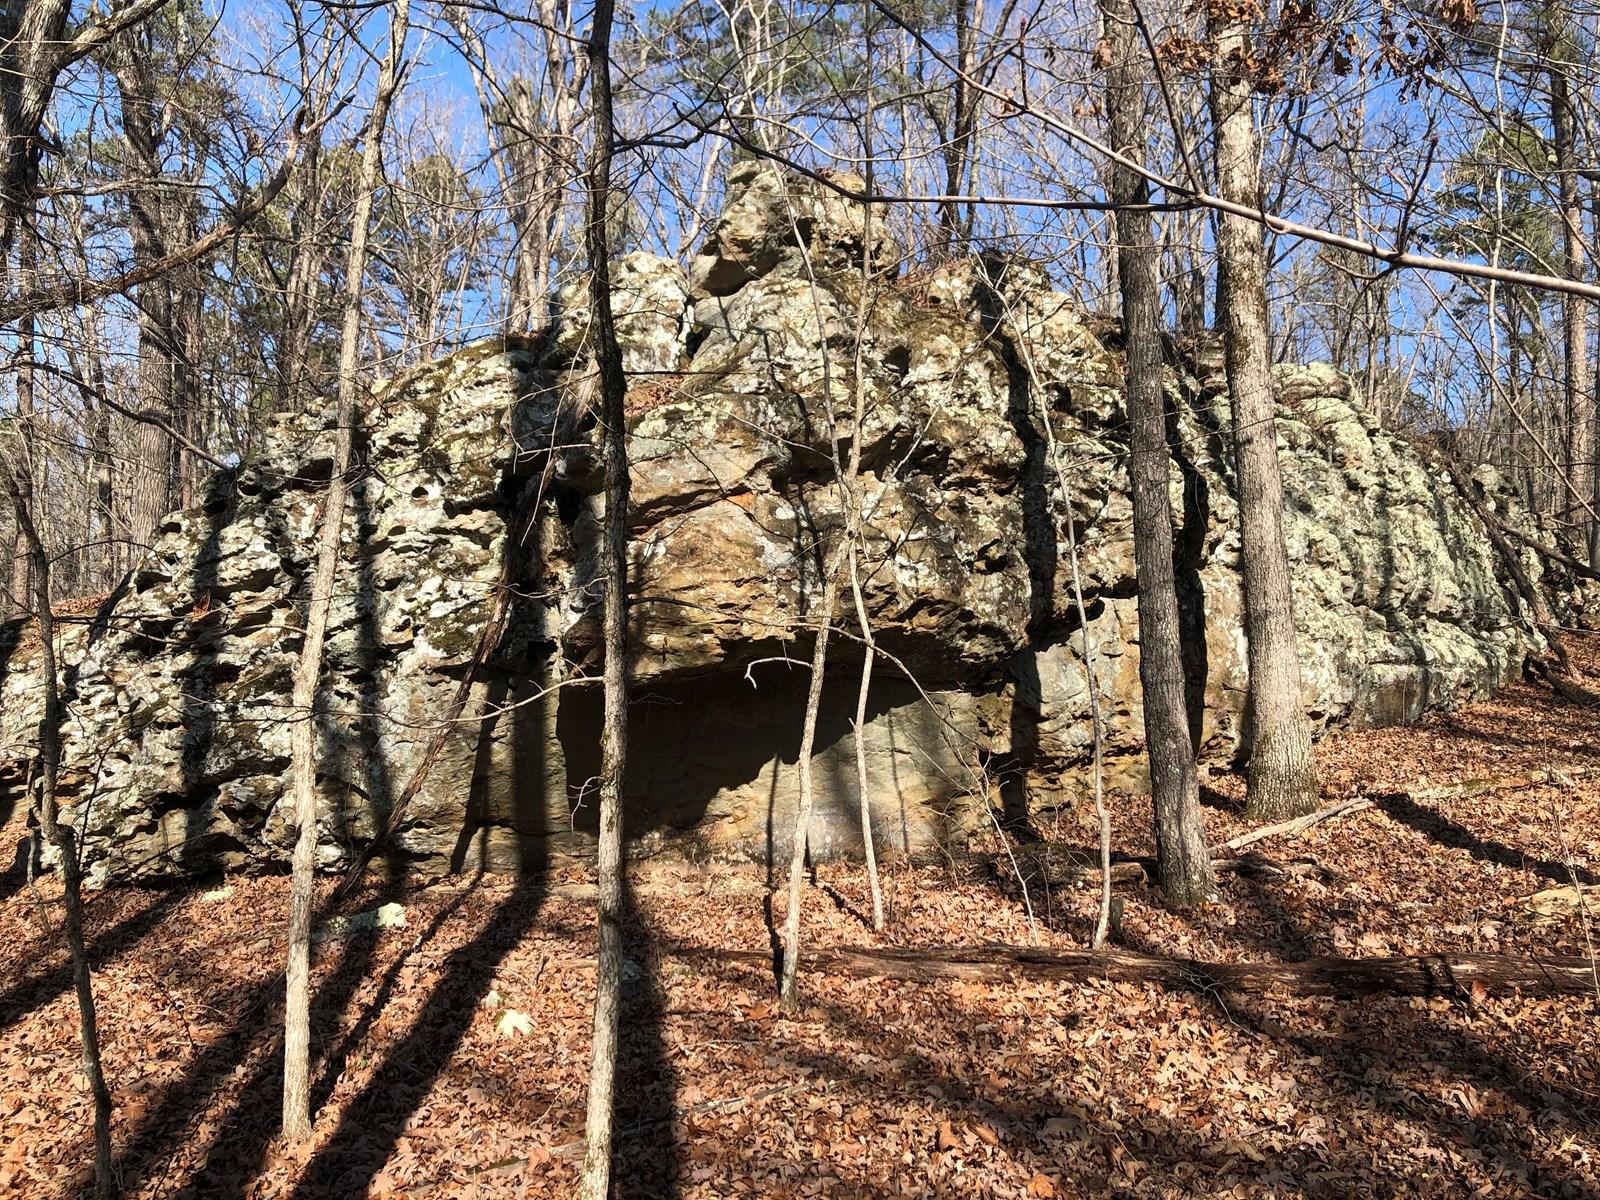 Hunting/Recreational Land in Arkansas